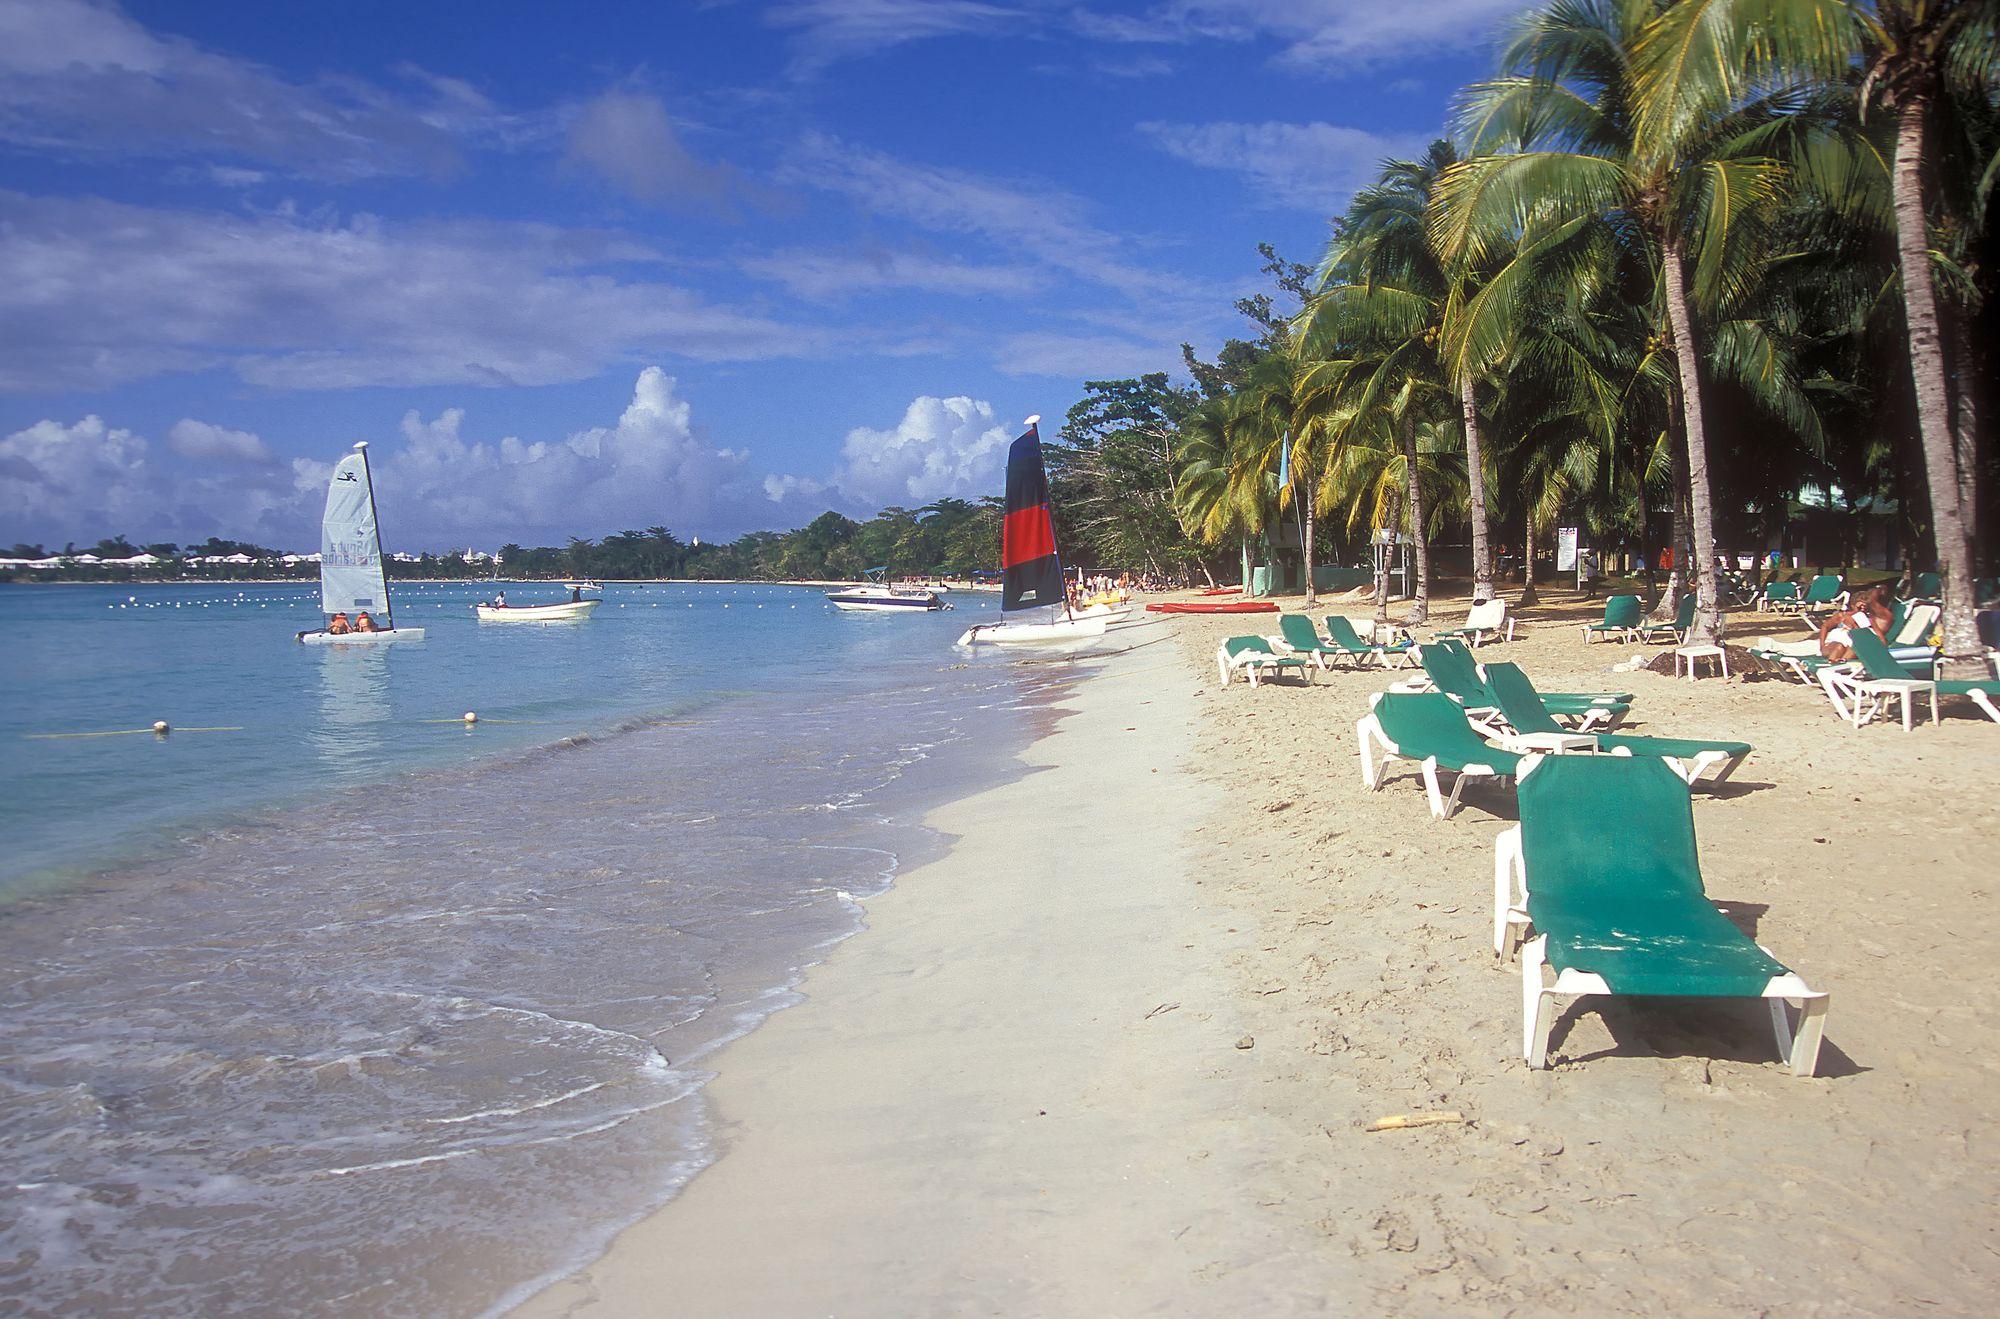 Negril Jamaica Vacations Negril Jamaica Vacation Negril Jamaica Jamaica Vacation